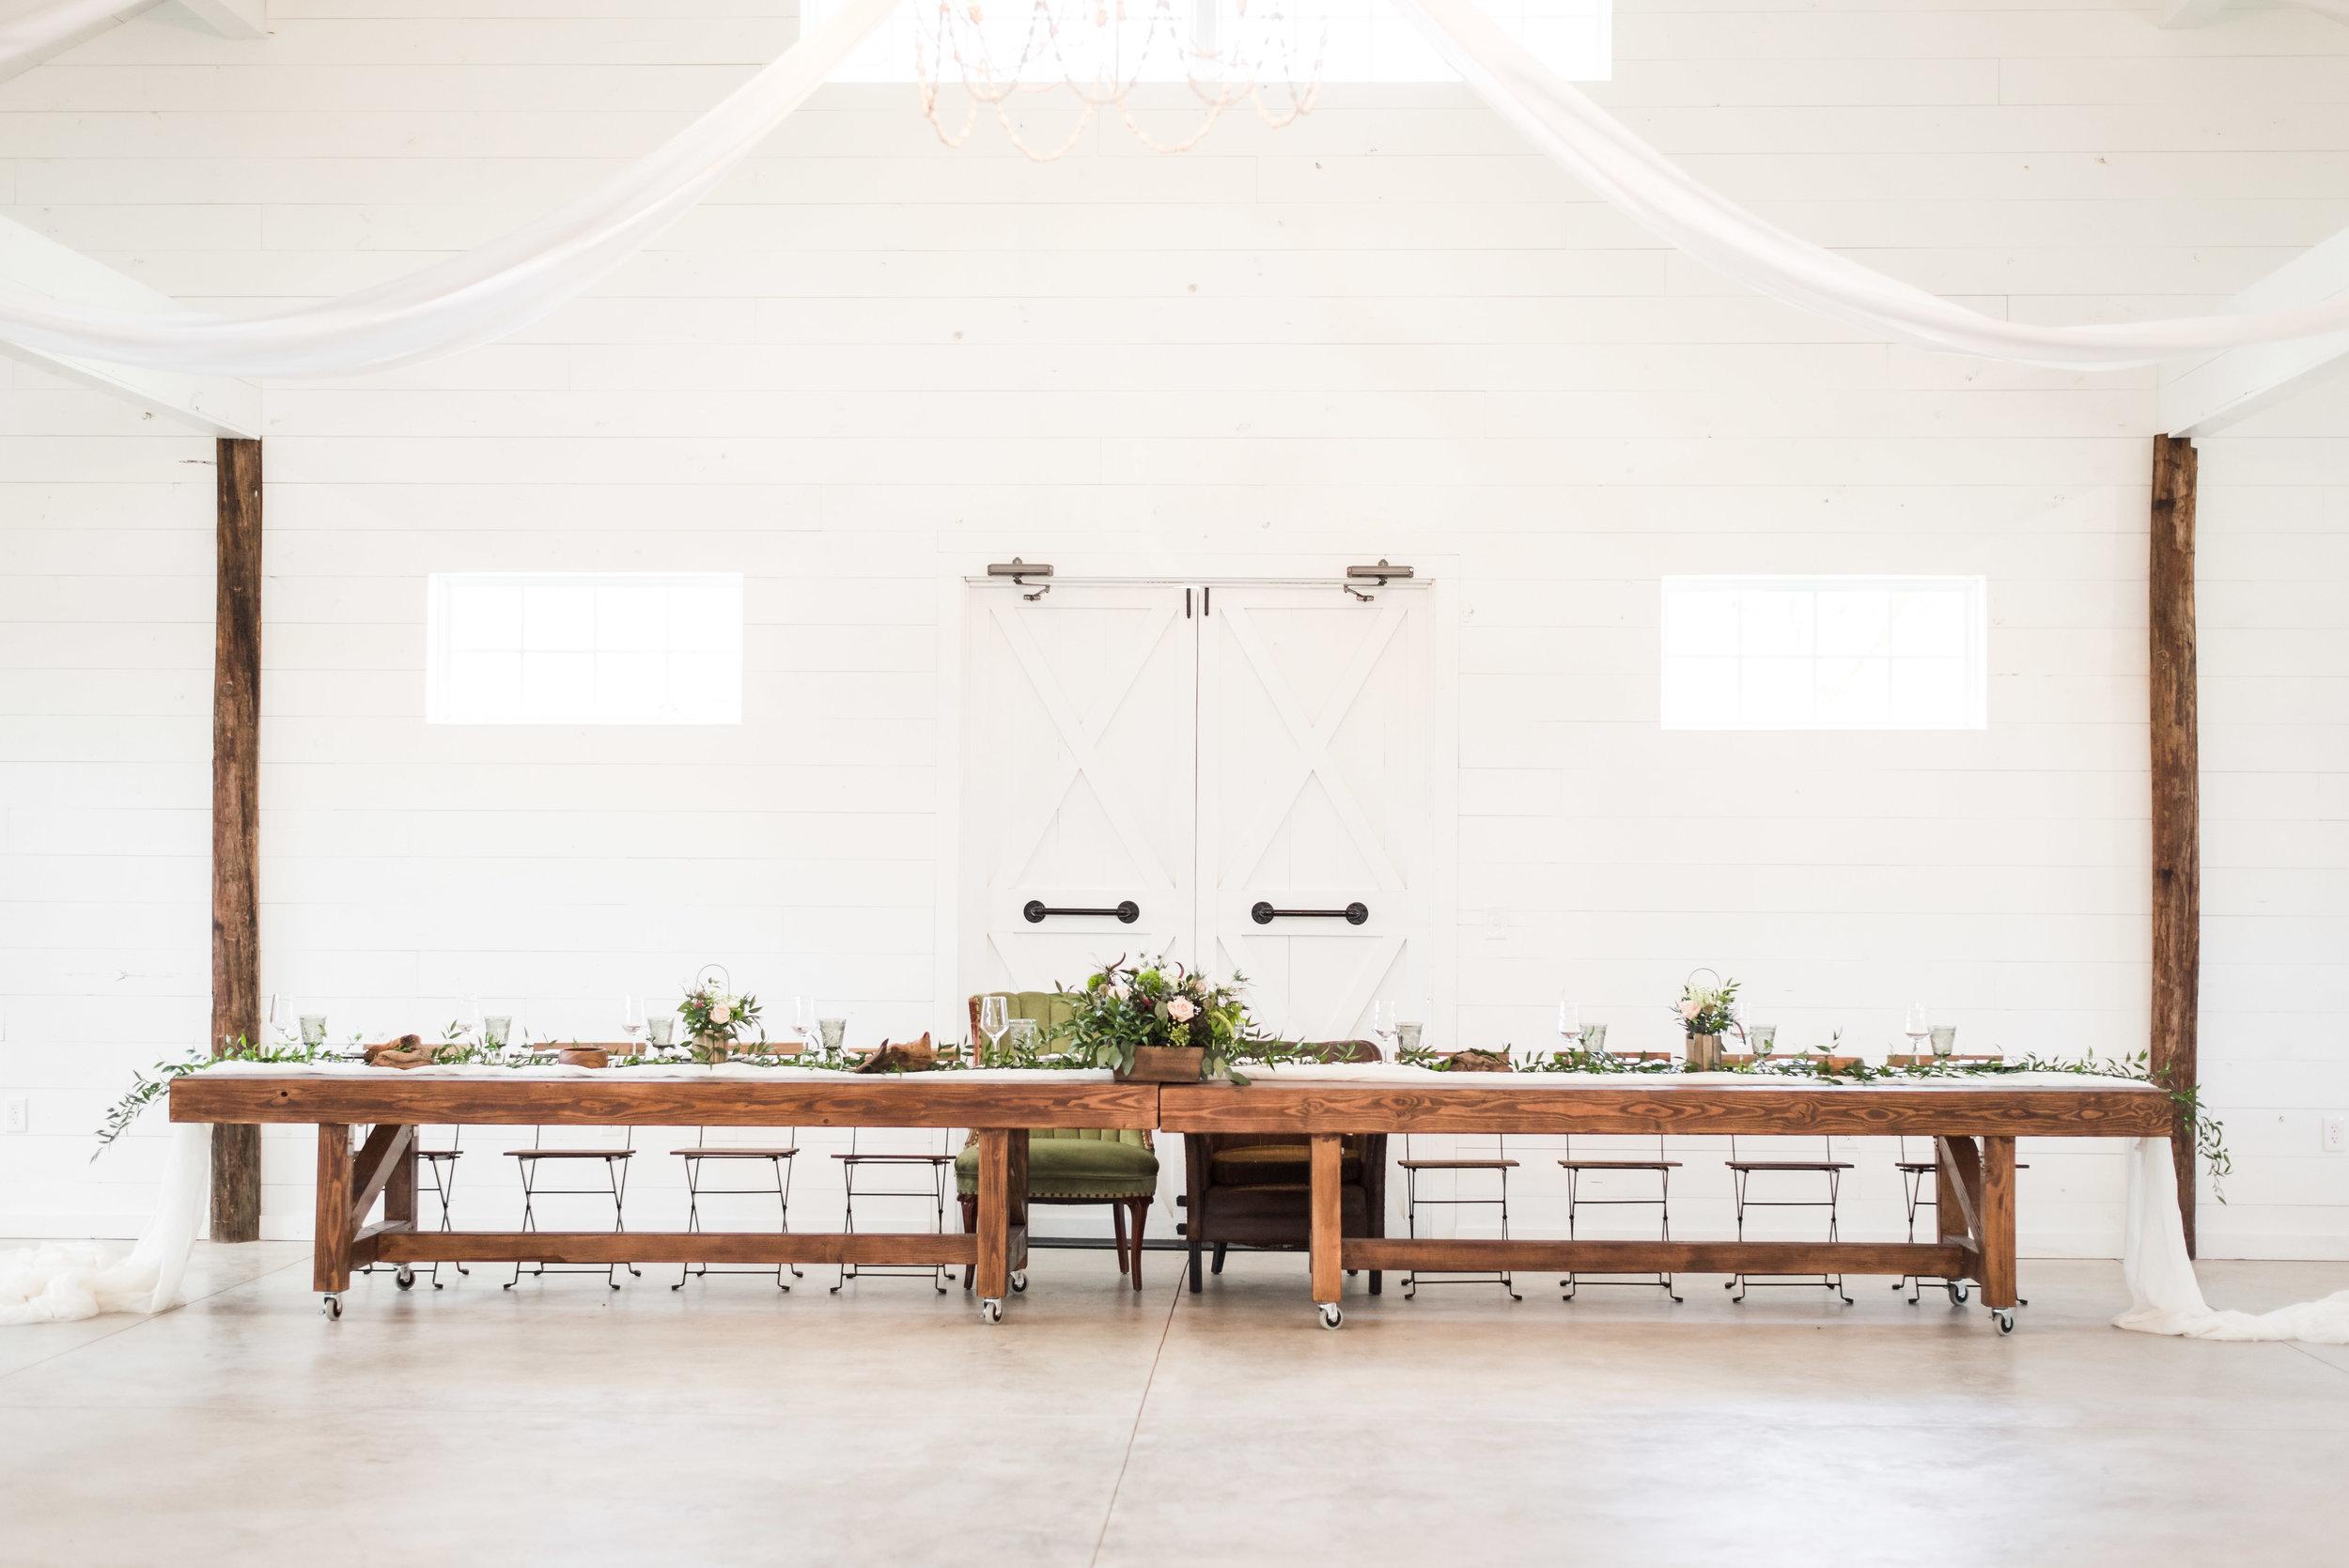 gray-door-photography-wedding-photographer-steph-erffmeyer-dallas-destination11.jpg